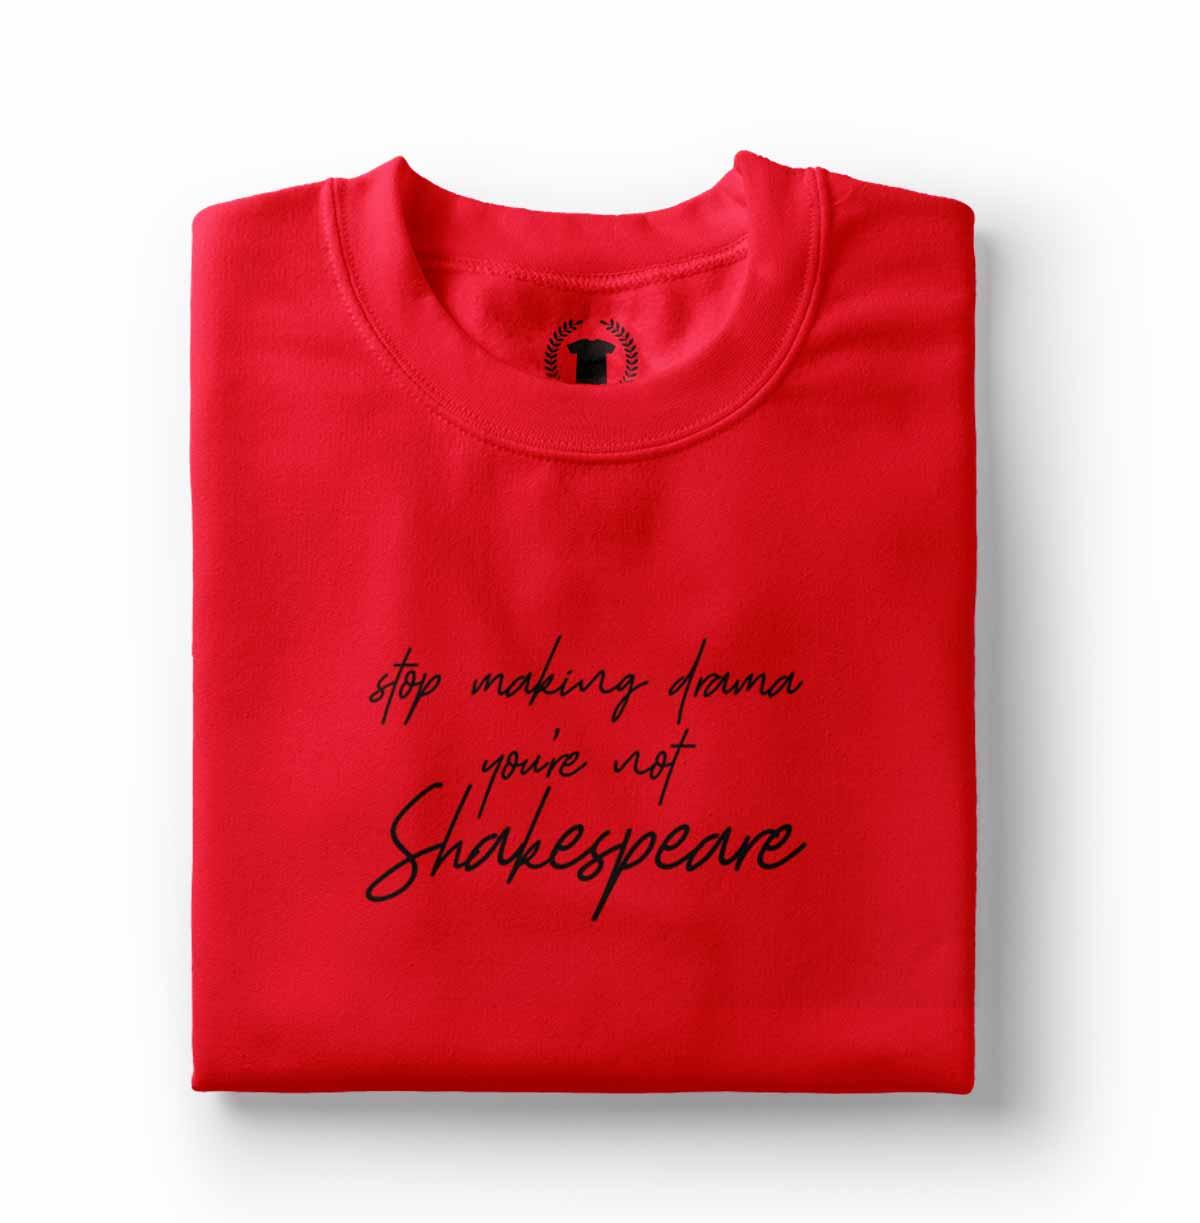 Camisa Frases engracadas Pare de drama shakespeare